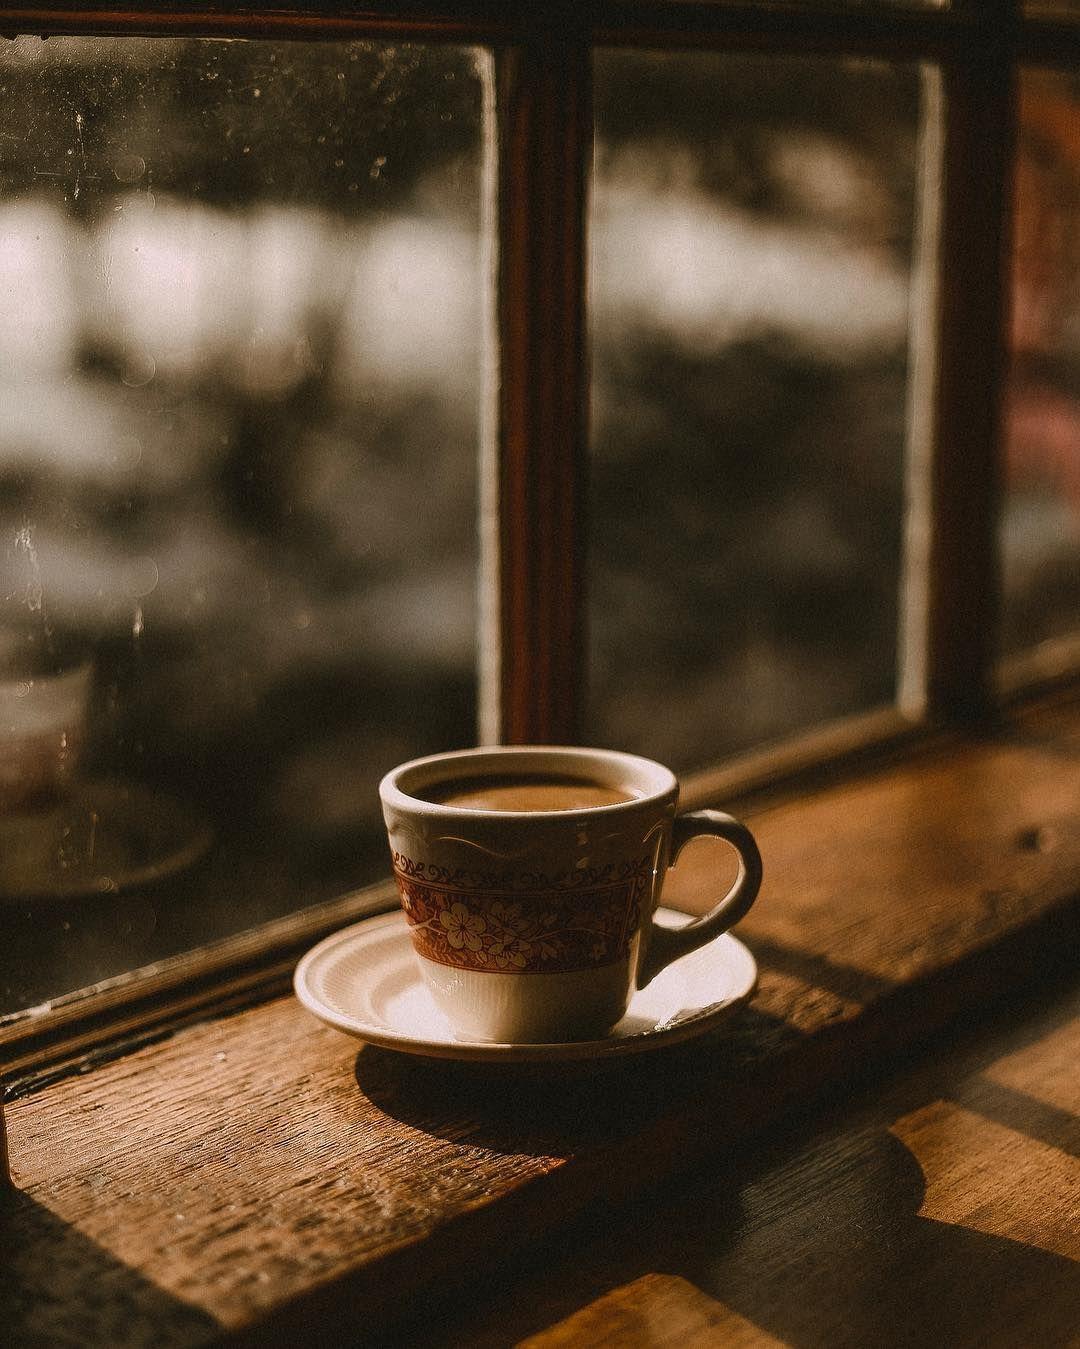 Rikki Austin On Instagram Cozy Cup Coffee And Books